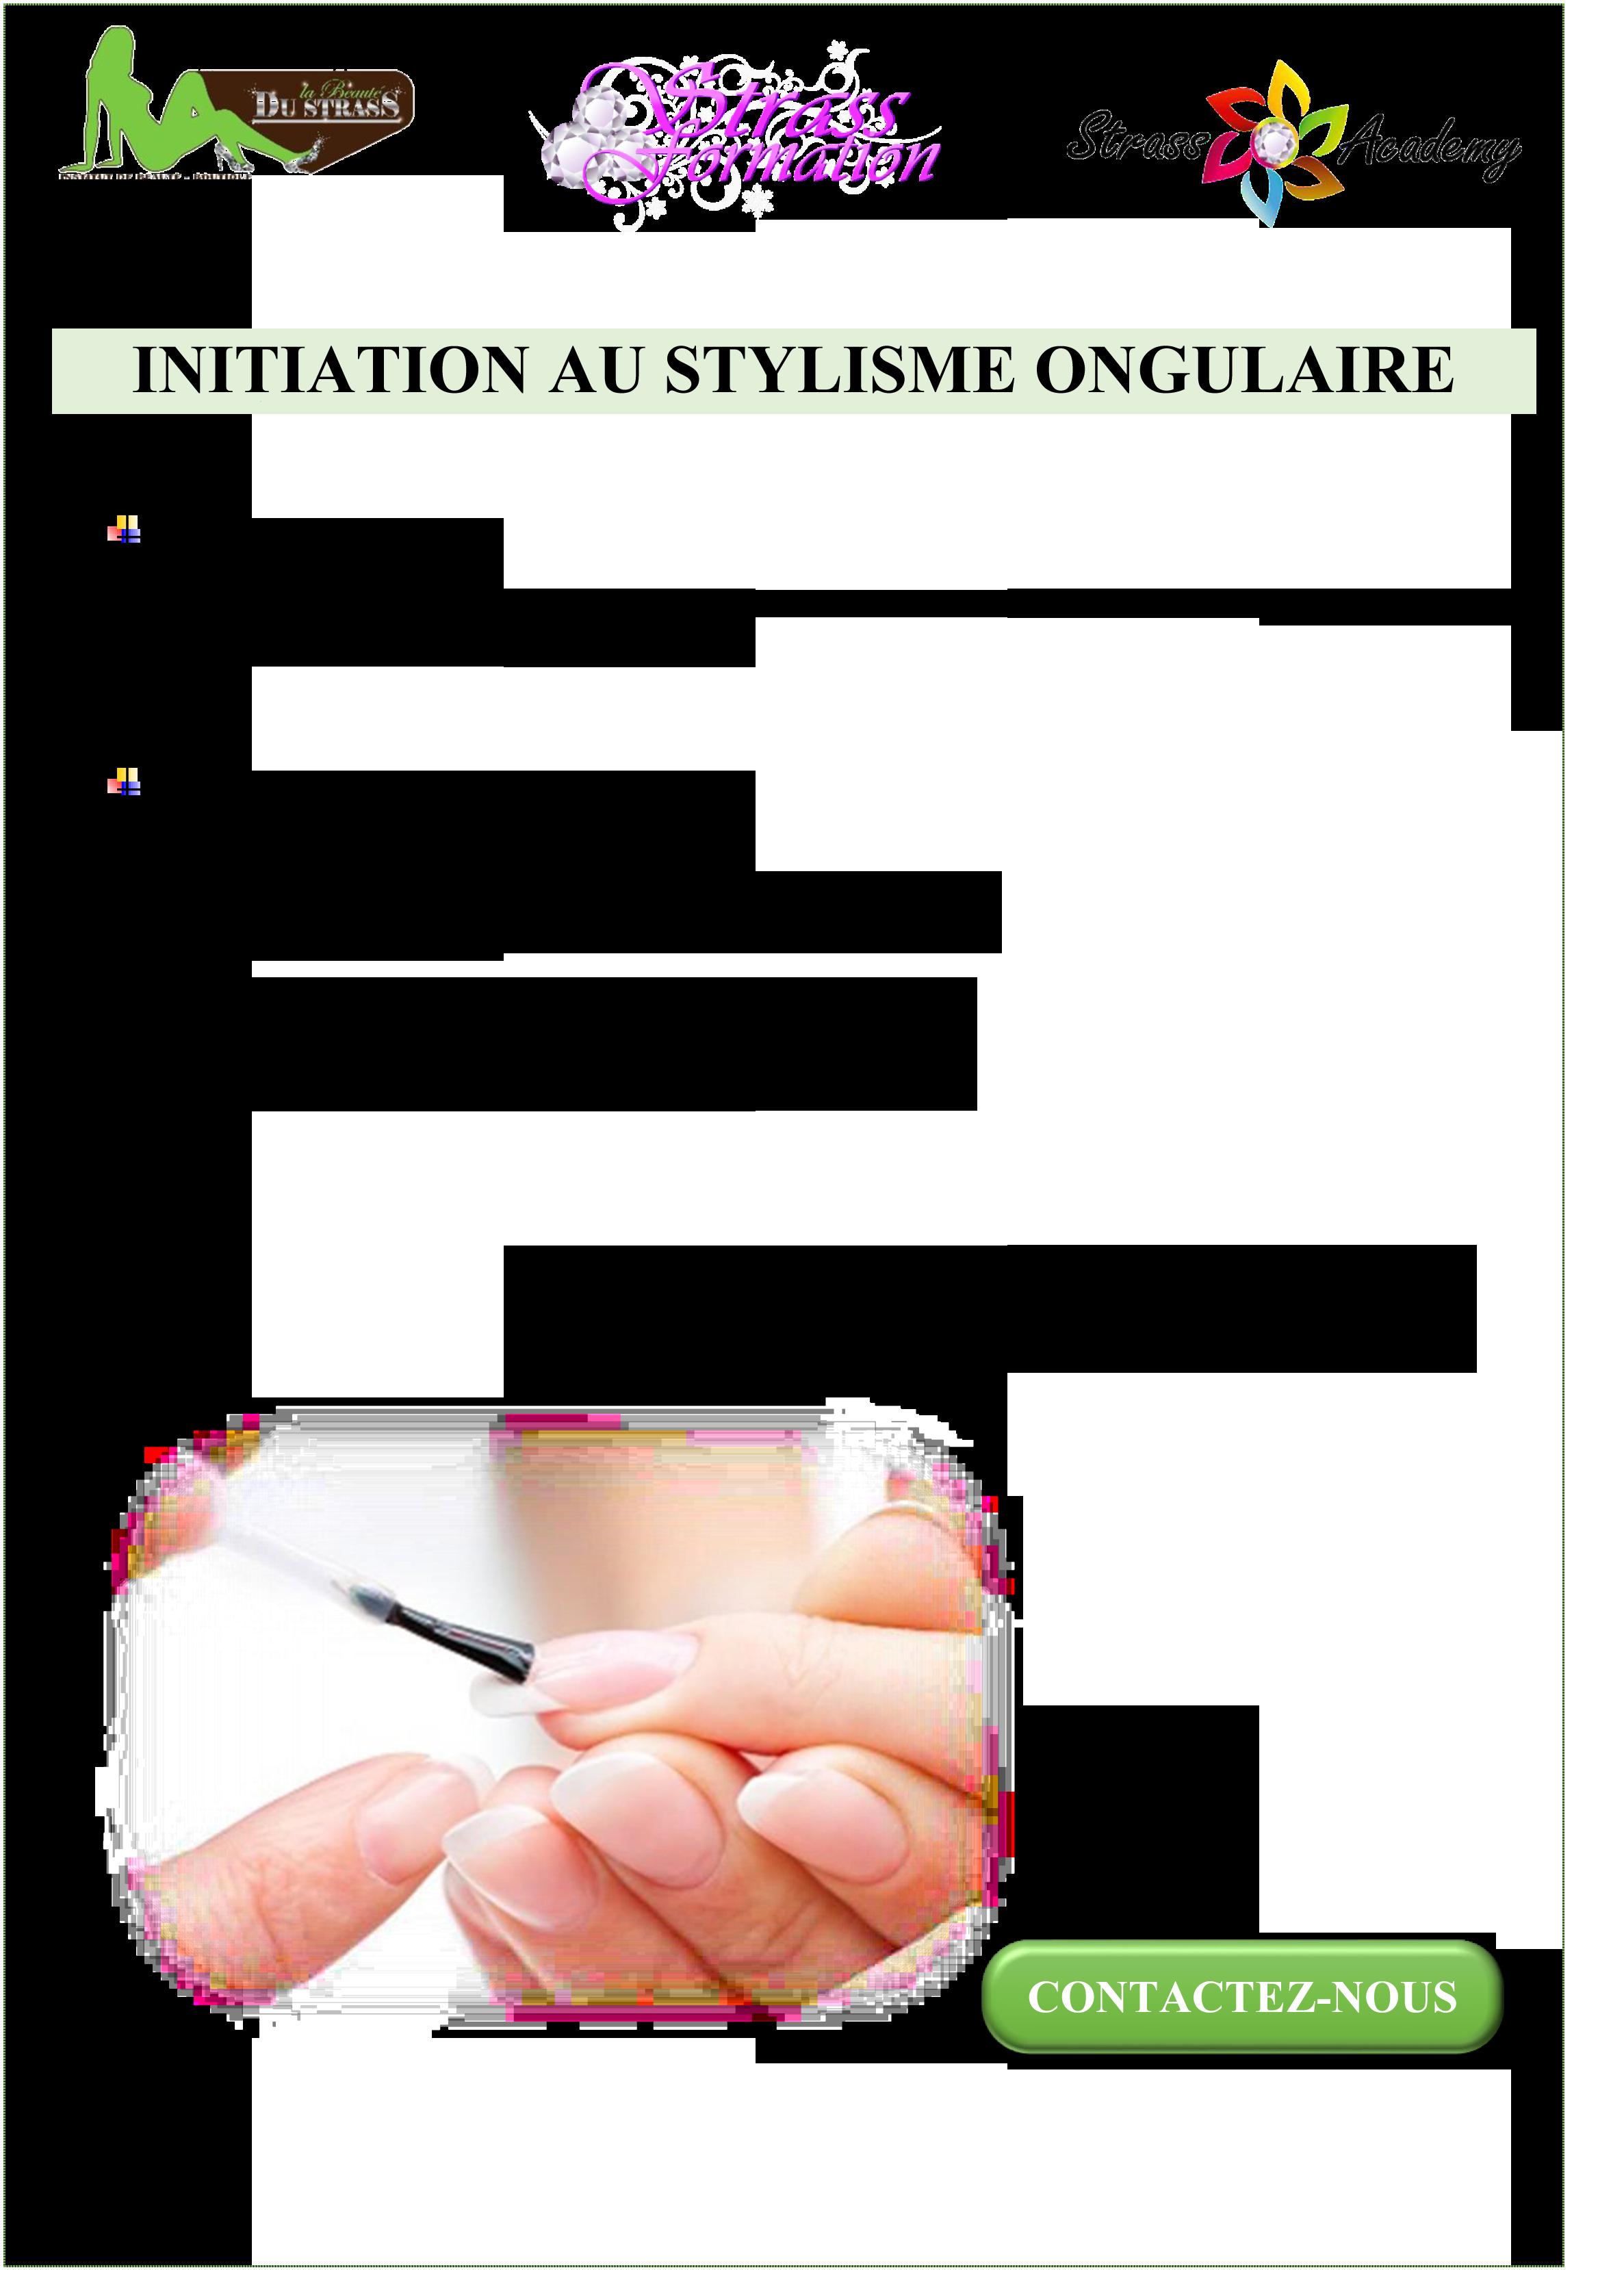 INITIATION AU STYLISME ONGULAIRE